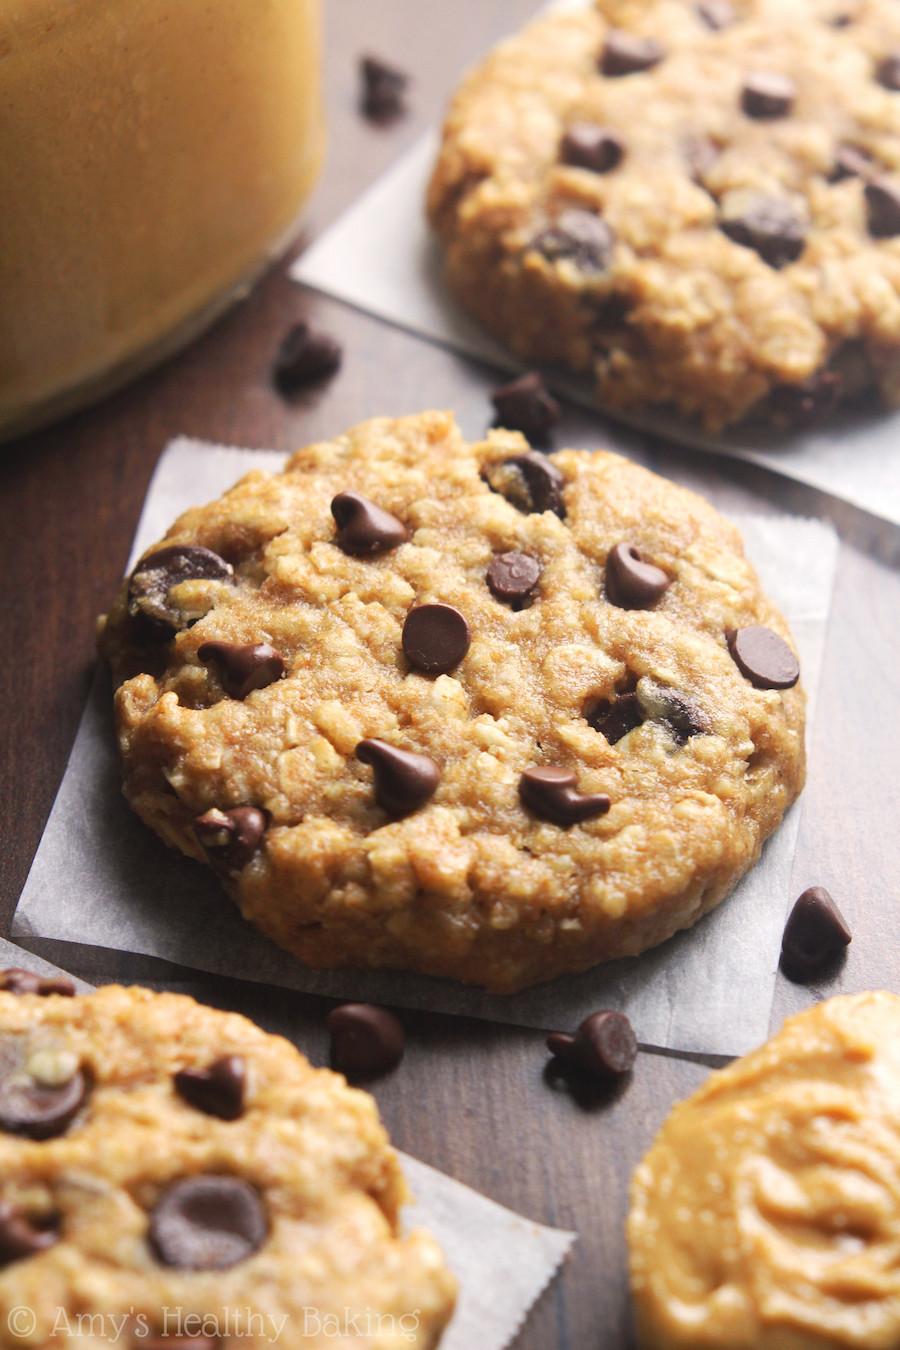 Oatmeal Peanut Butter Cookies Healthy  Chocolate Chip Peanut Butter Oatmeal Cookies Recipe Video